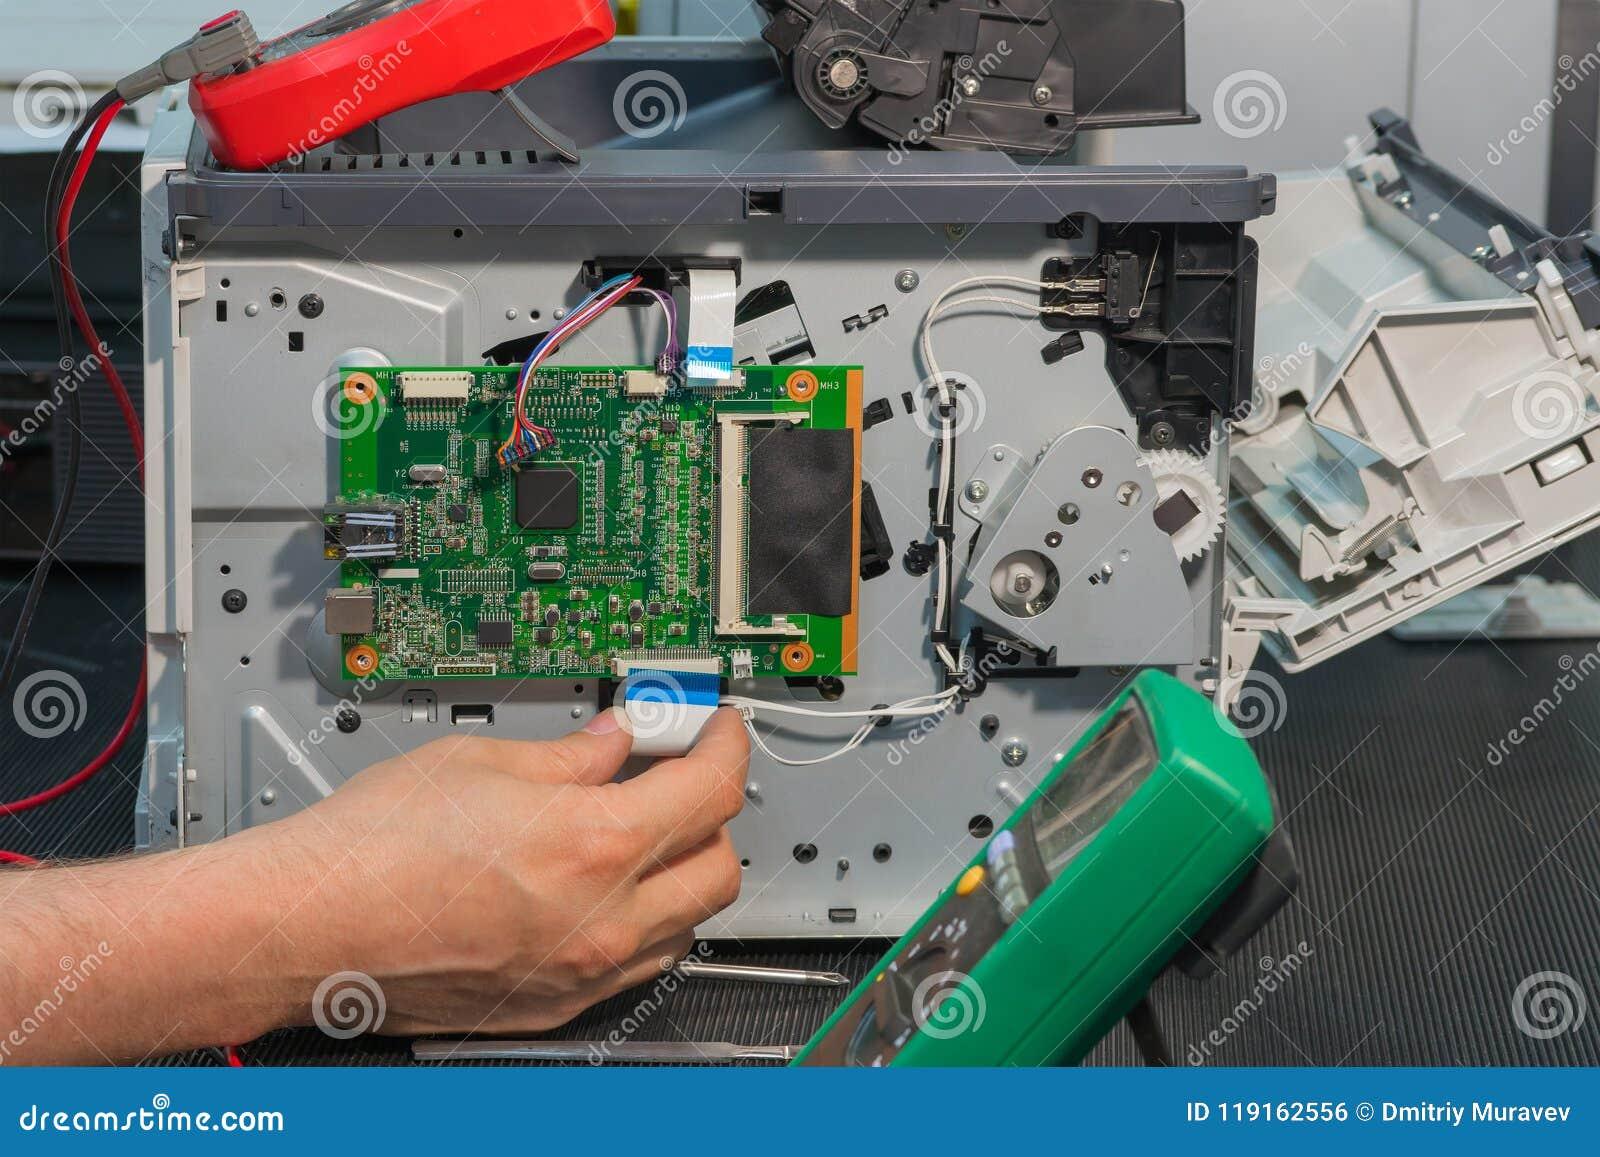 Printed Circuits Connection To Cable Not Lossing Wiring Diagram Printedcircuitboardassembliesjpg Laser Printer Repair Of The Ribbon Rh Dreamstime Com Broken Star Delta Circuit